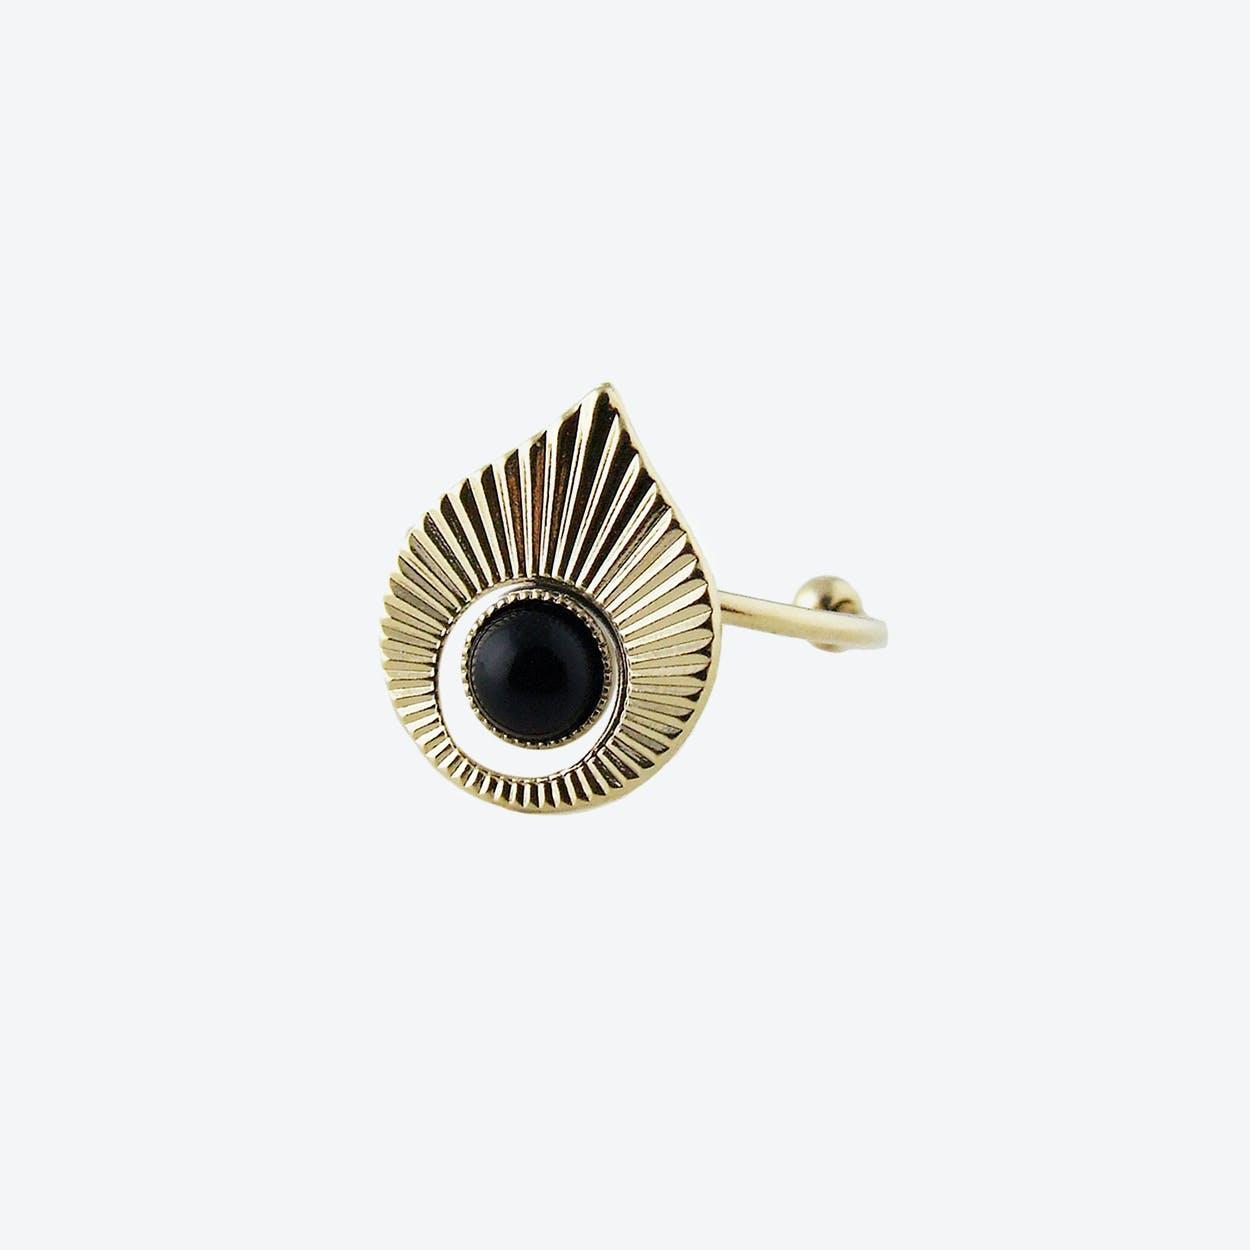 Gold Art Deco inspired Ring in Black